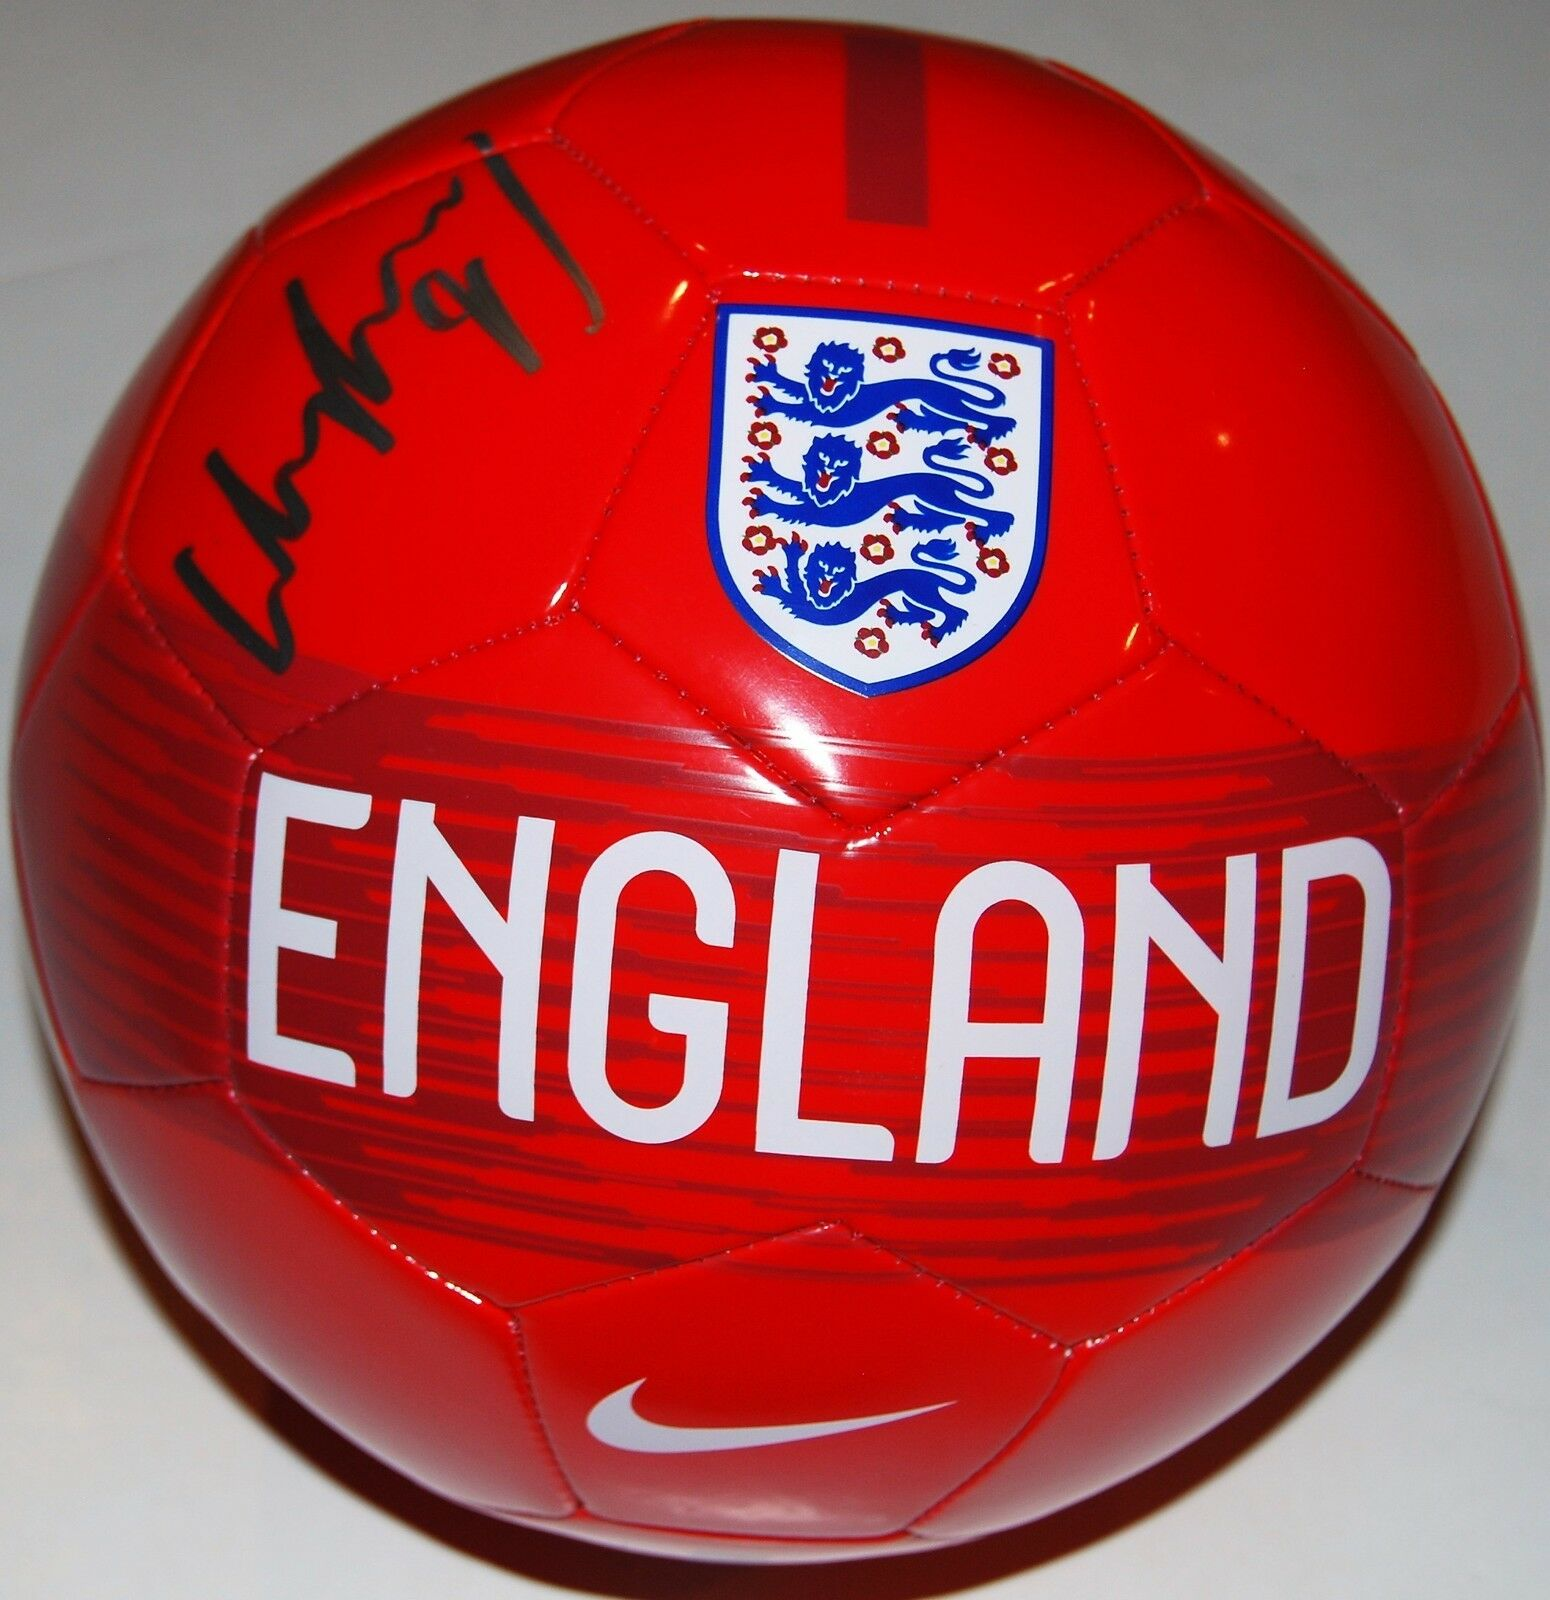 Wayne Rooney Firmado (Inglaterra) Manchester Manchester Manchester United Probado Dc Balón de Fútbol 35df68